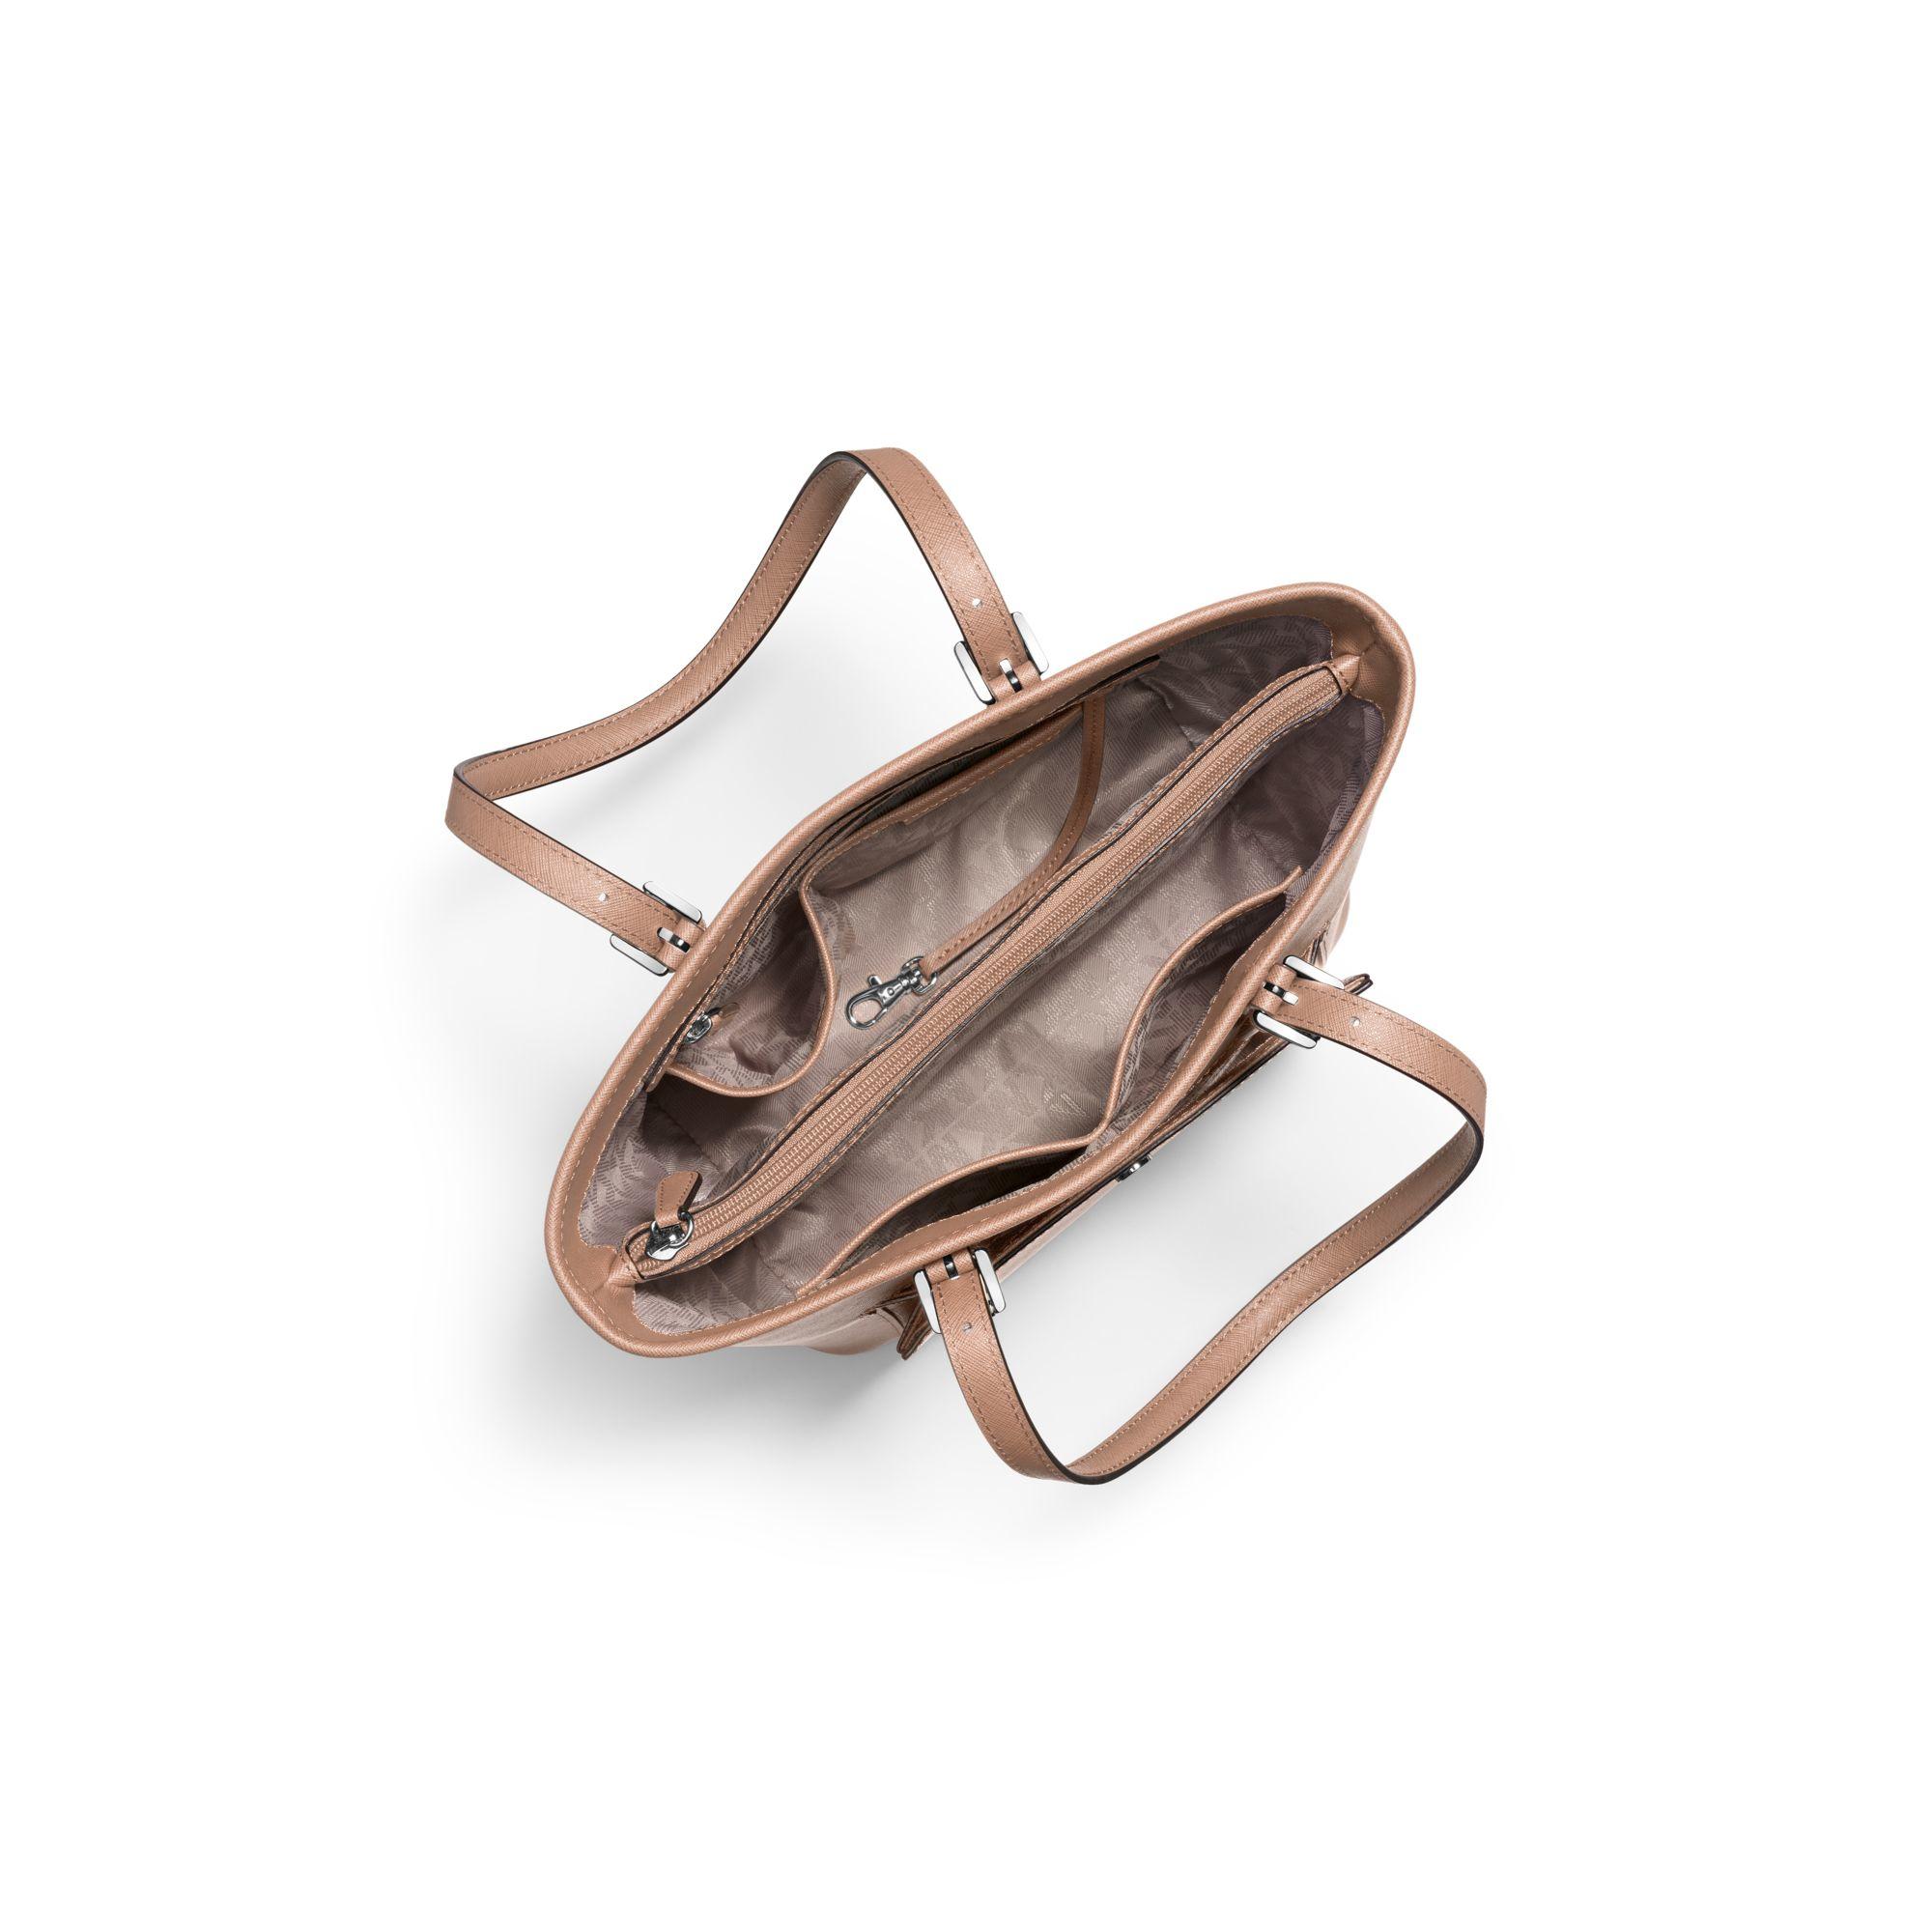 michael kors jet set medium saffiano leather tote in pink. Black Bedroom Furniture Sets. Home Design Ideas